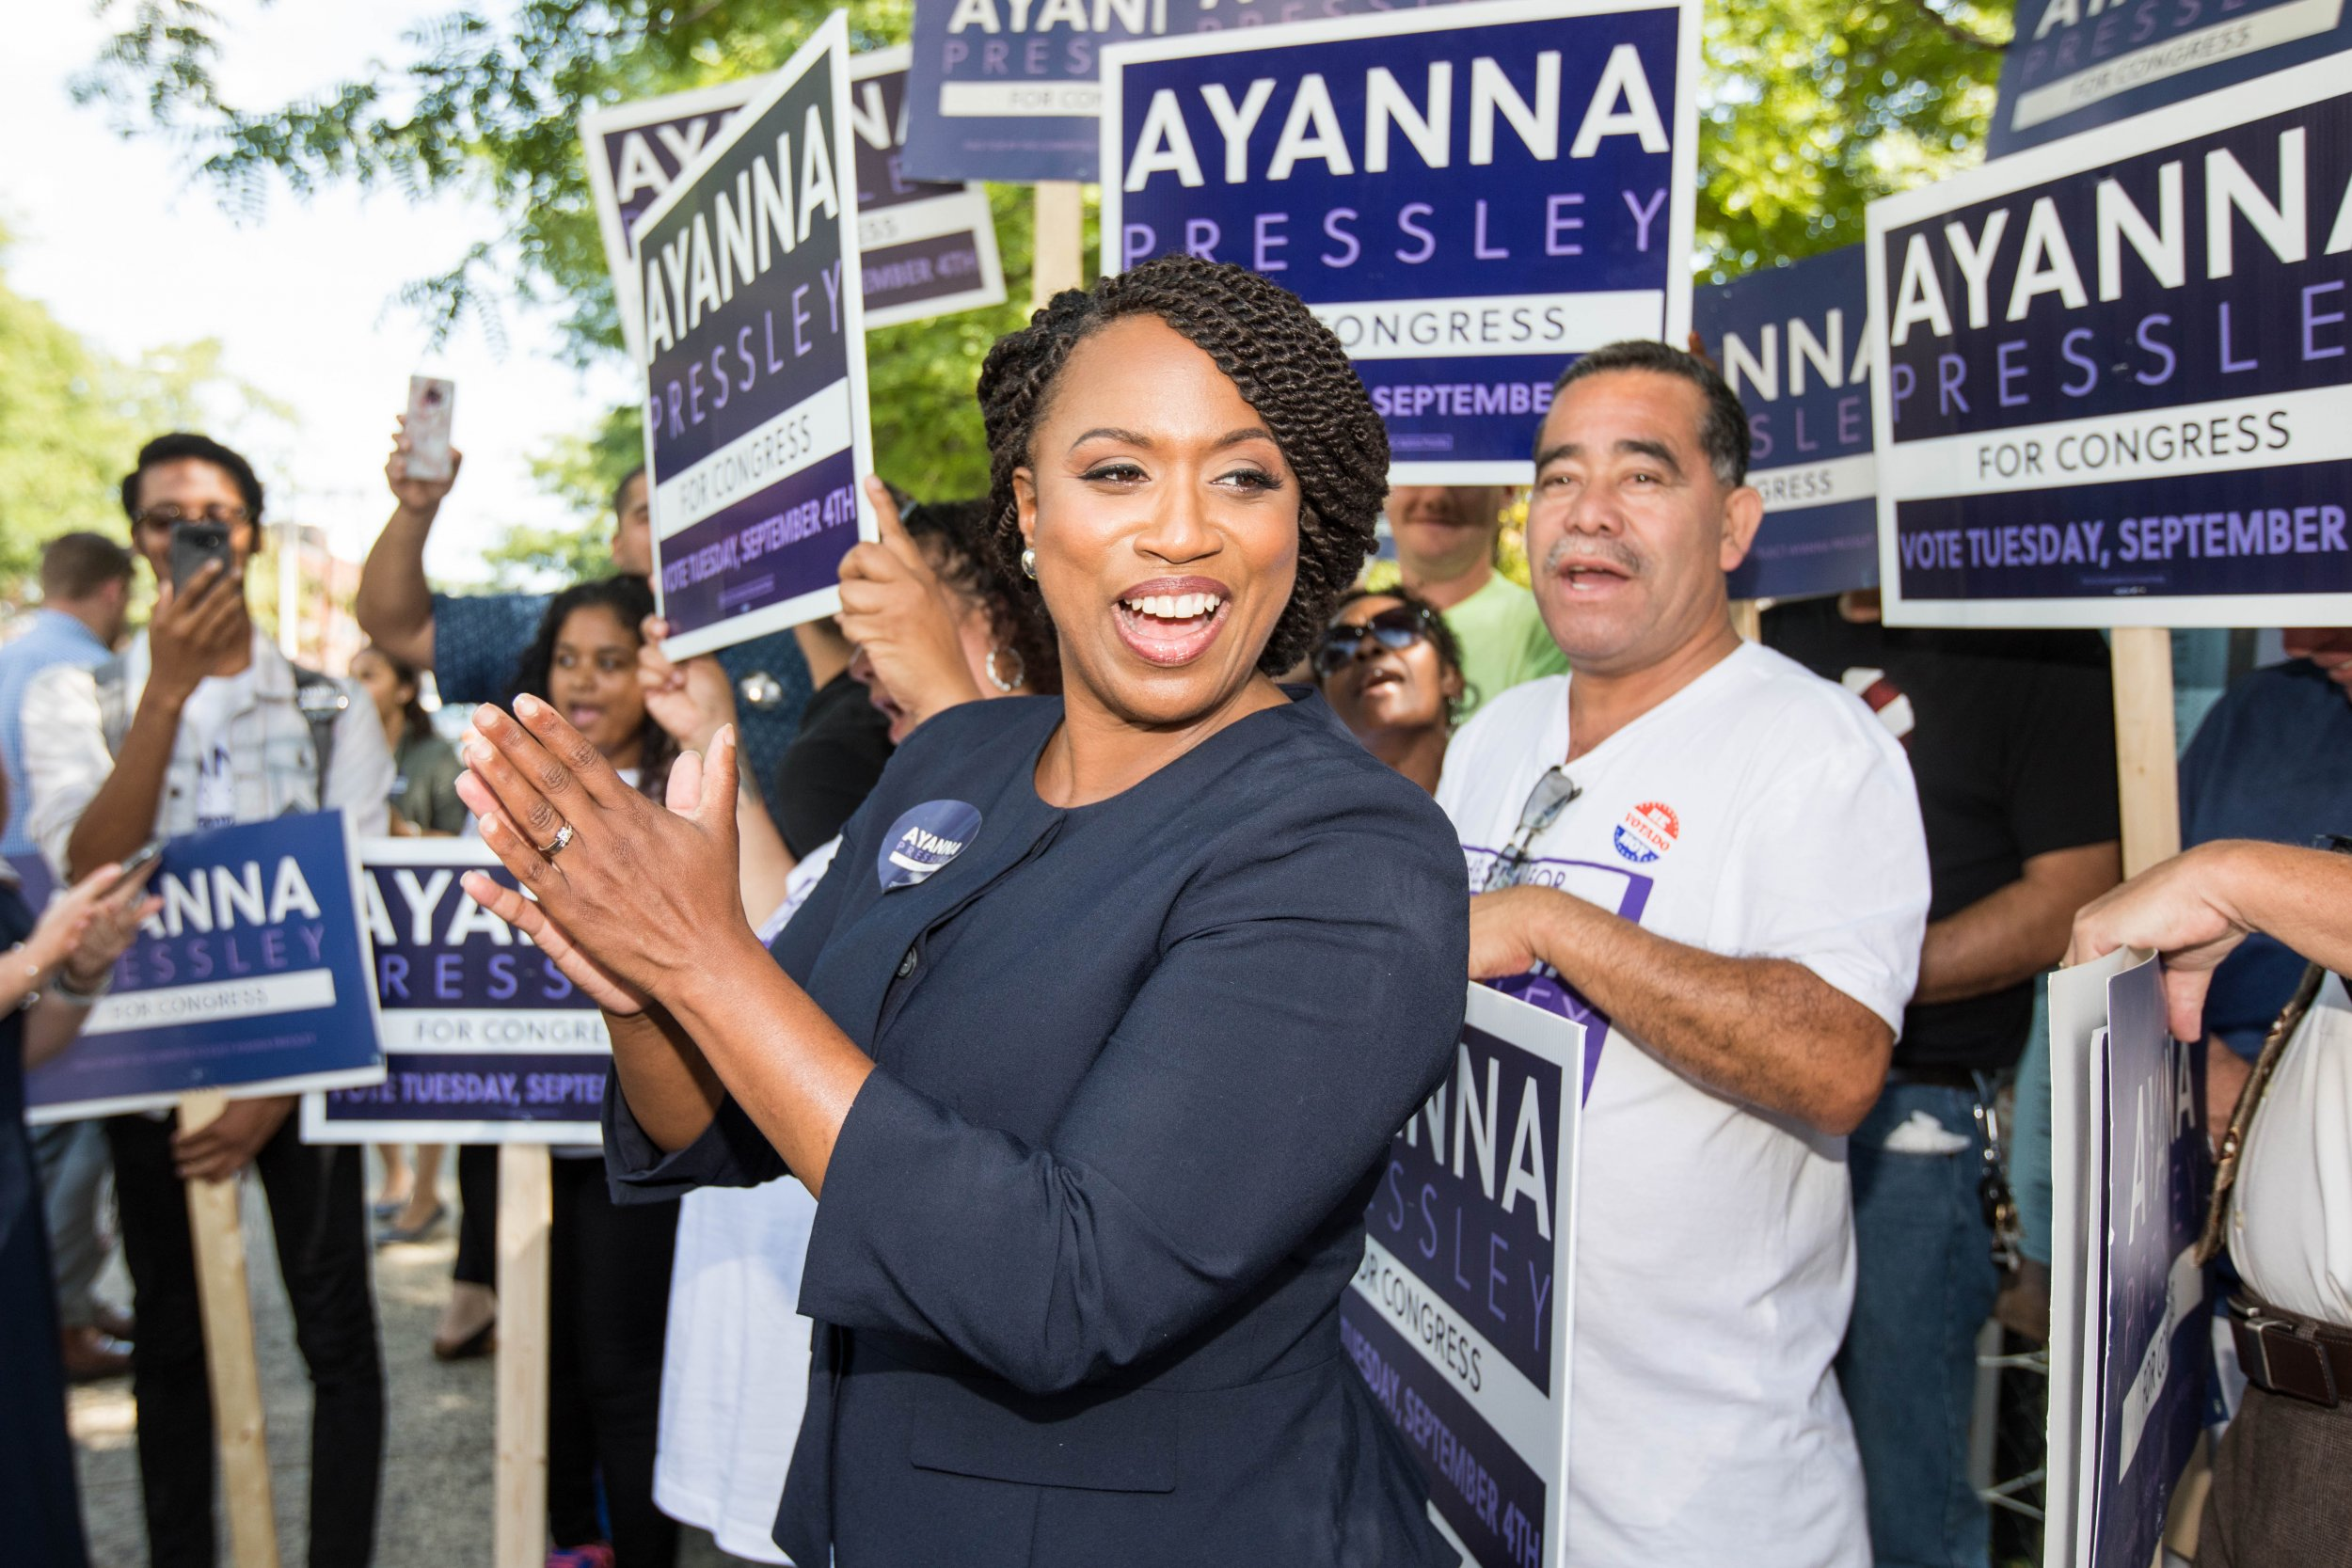 Ayanna Pressley, Massachusetts primary election